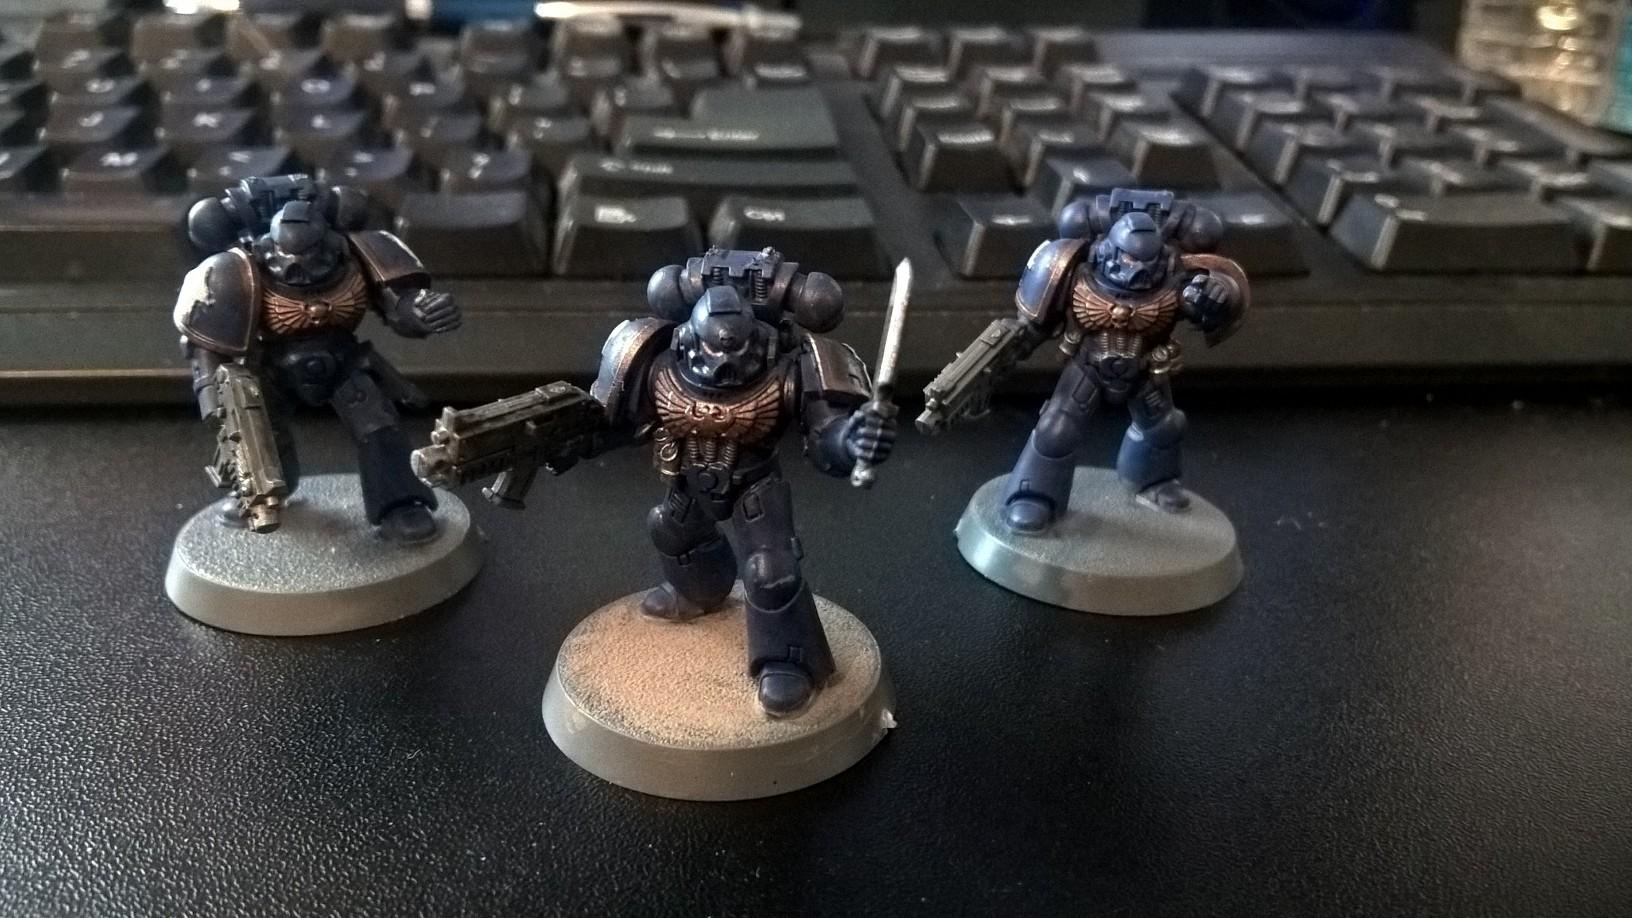 Adeptus Astartres, Imperium, Space, Space Marines, Ultramarines, Warhammer 40,000